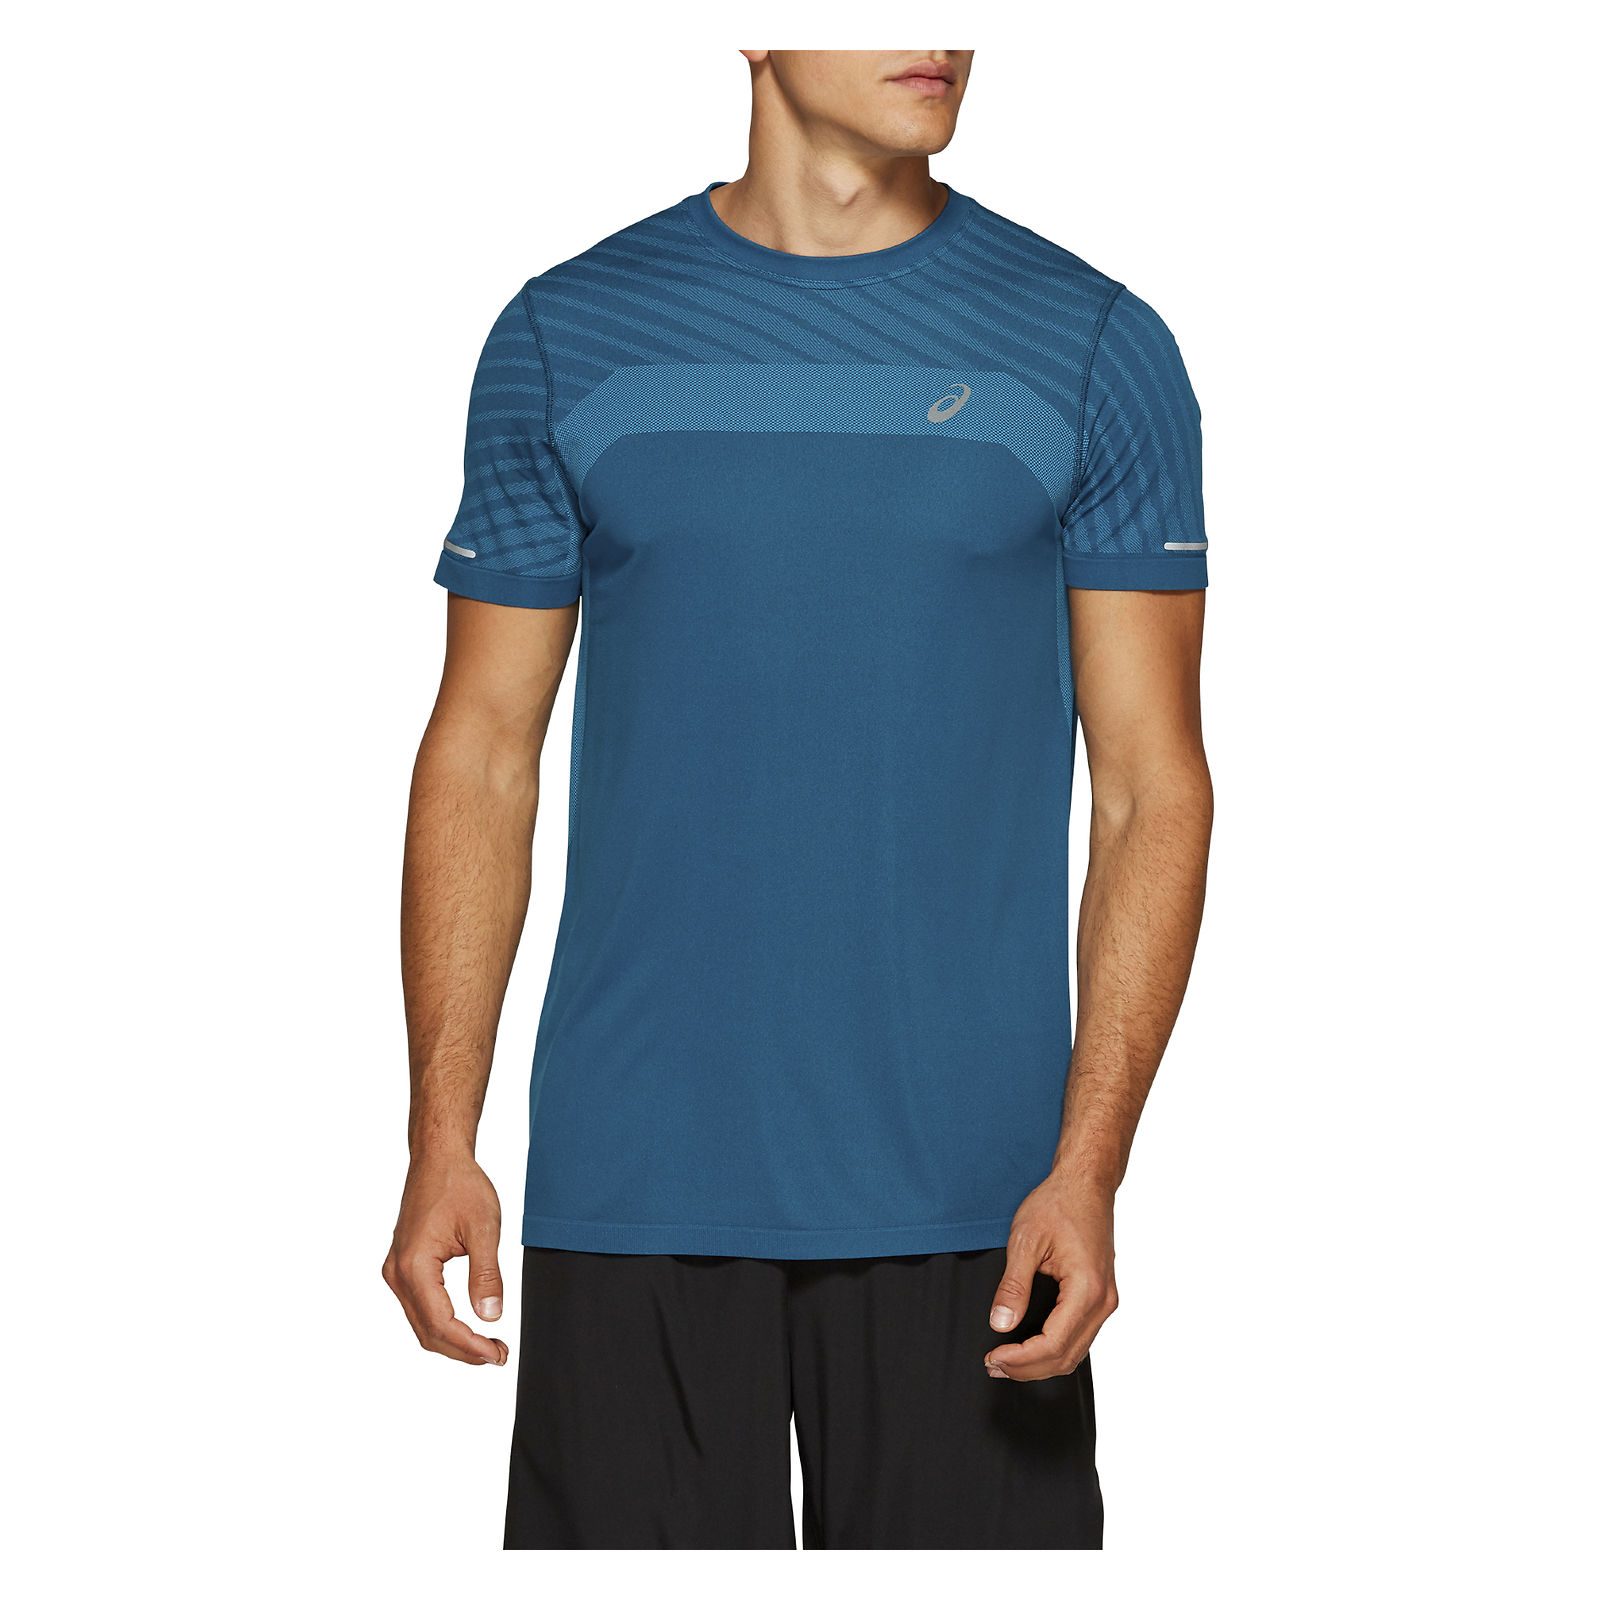 Koszulka męska do biegania Asics Seamless Texture 2011A601